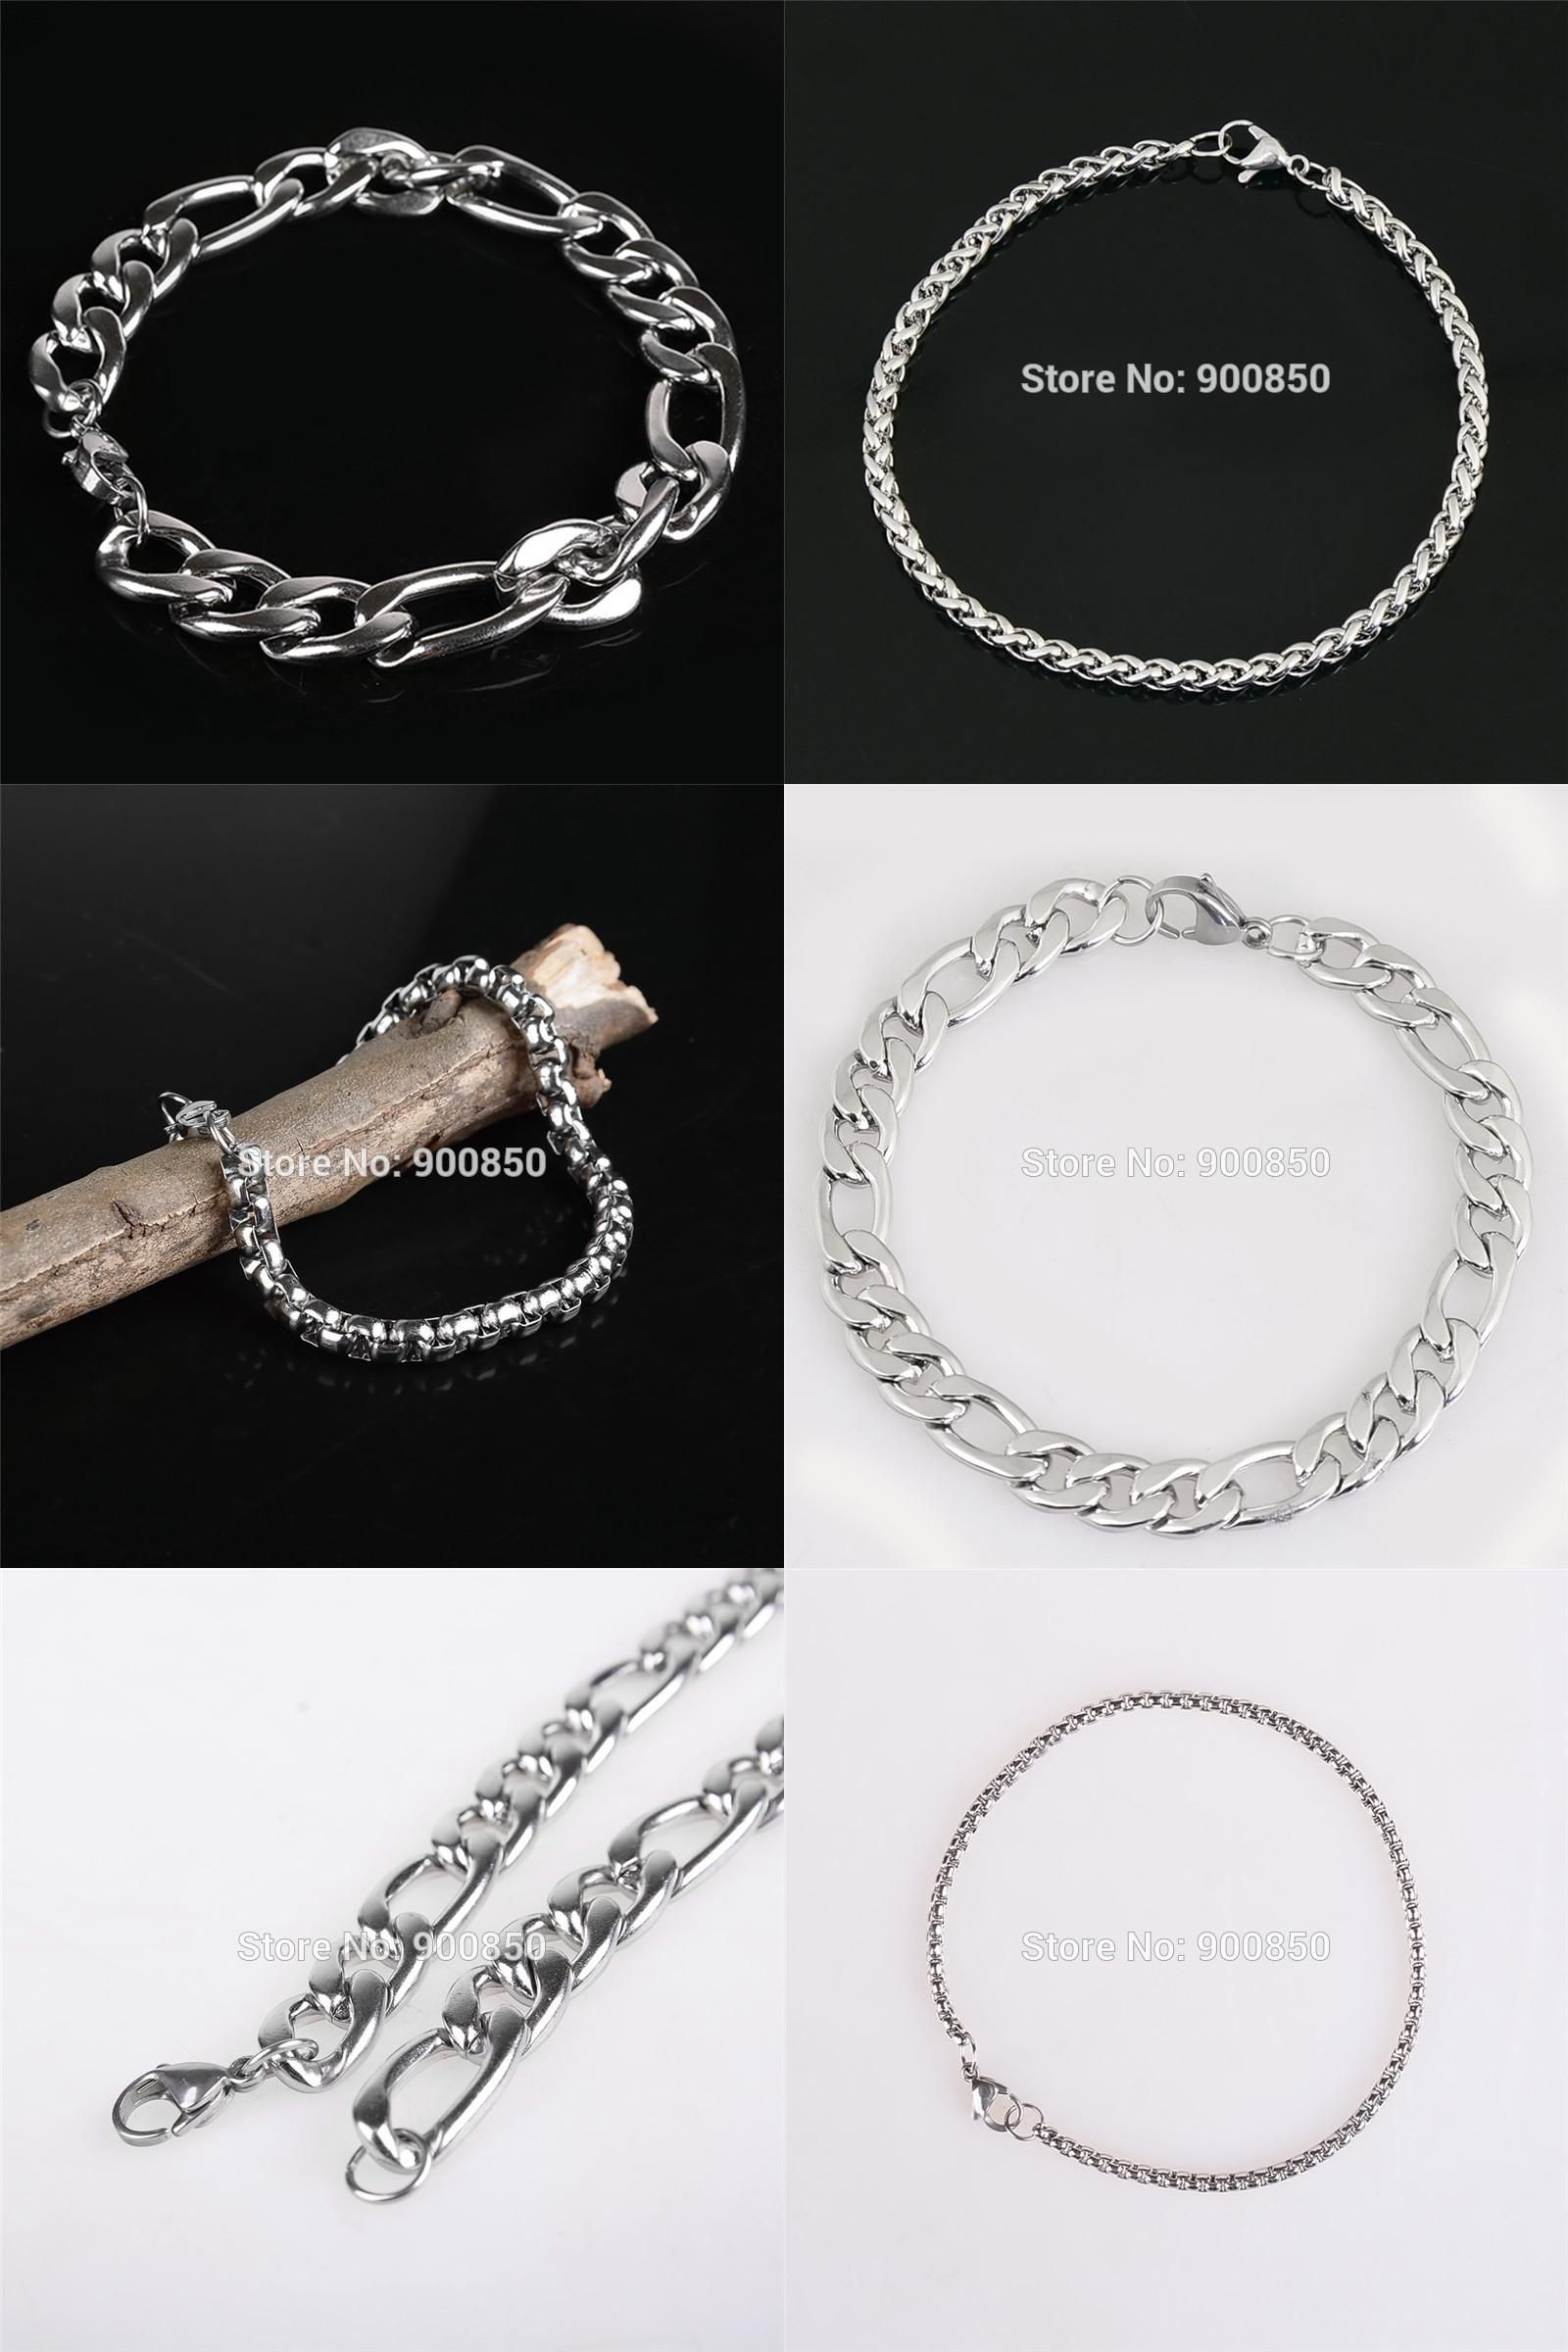 Visit to buy styles mens bracelets u bangles l stainless